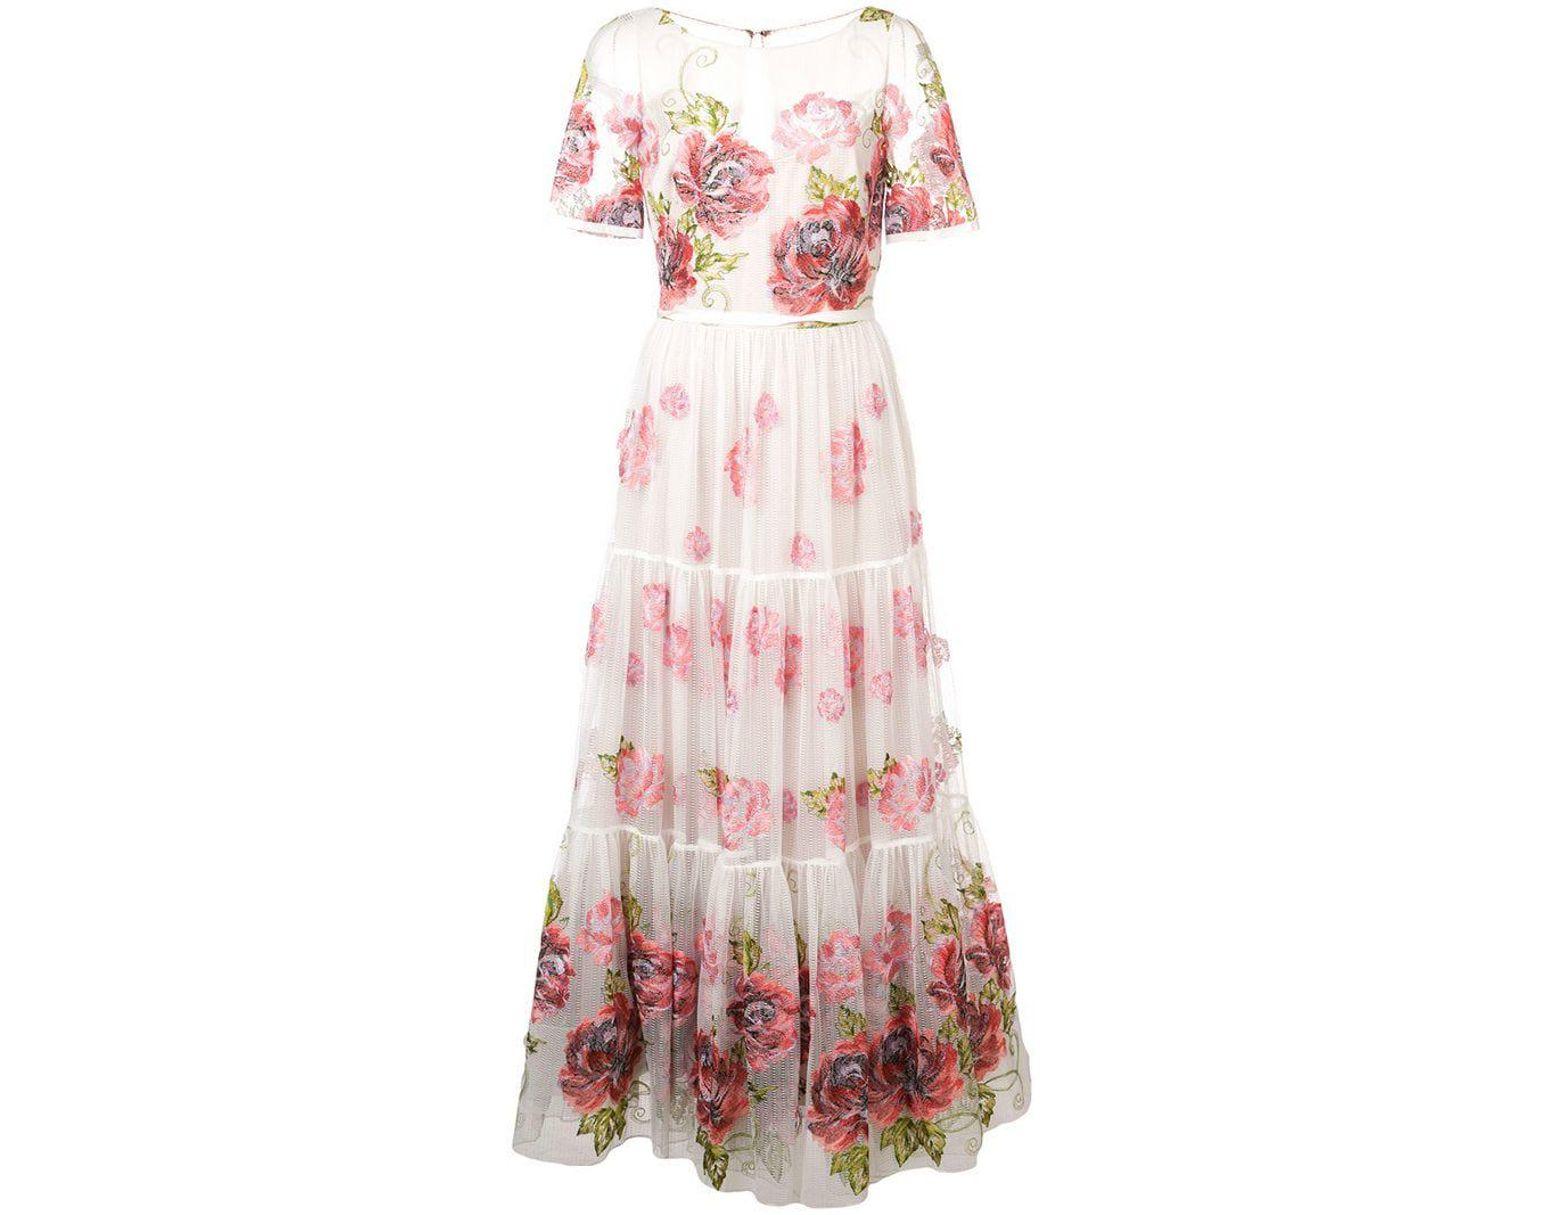 3af078102355 Marchesa notte Floral Print Long Dress in White - Lyst